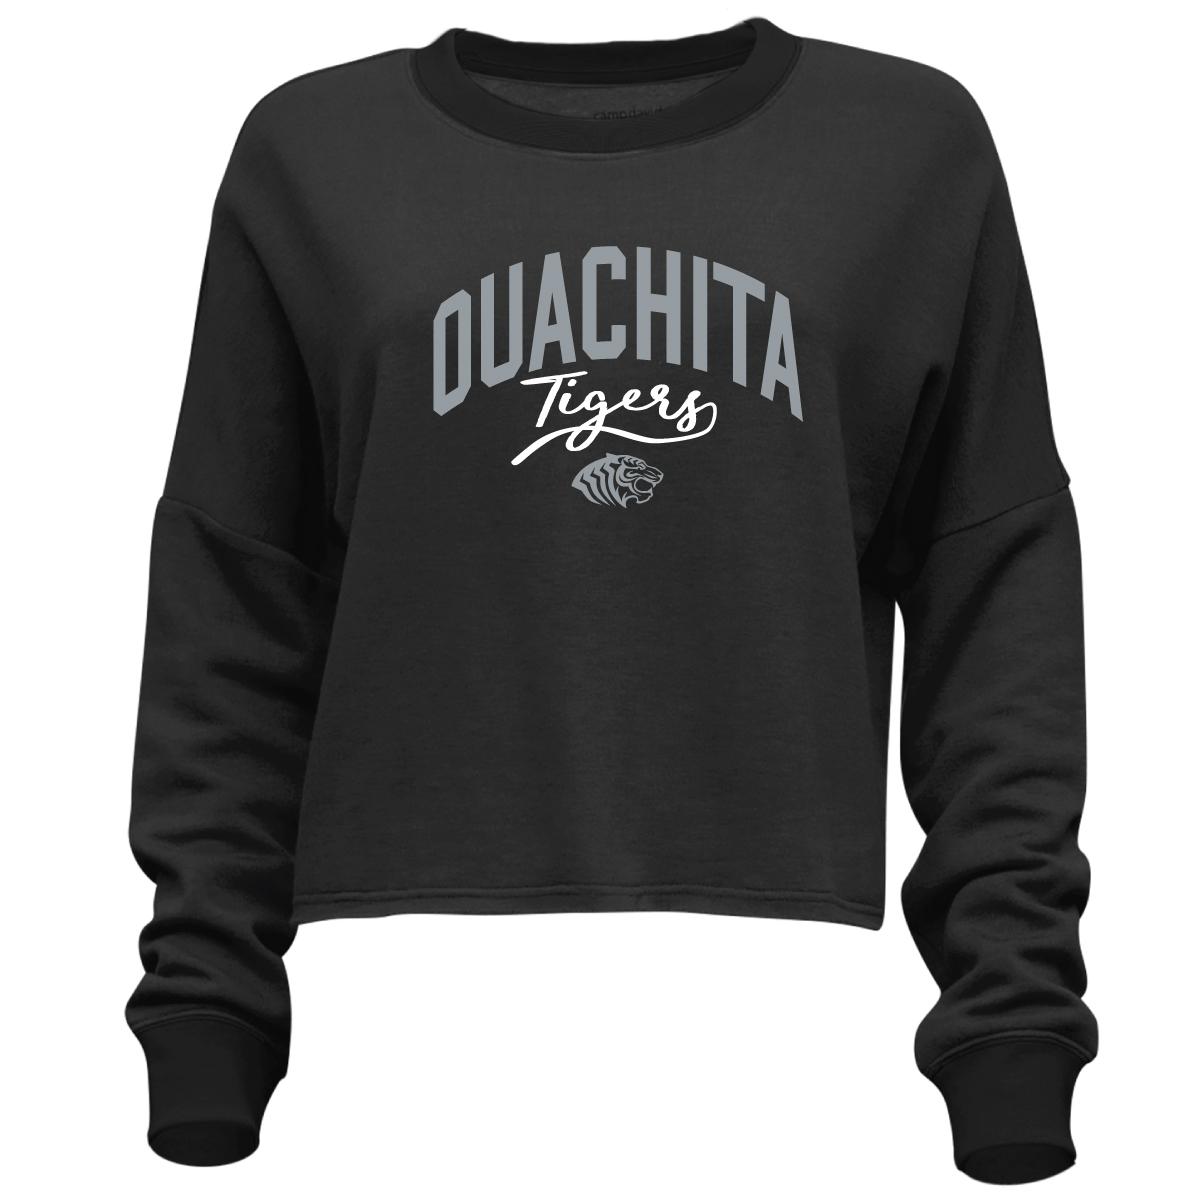 OUACHITA TIGERS FLASH DANCE CROPPED LONG SLEEVE T-SHIRT